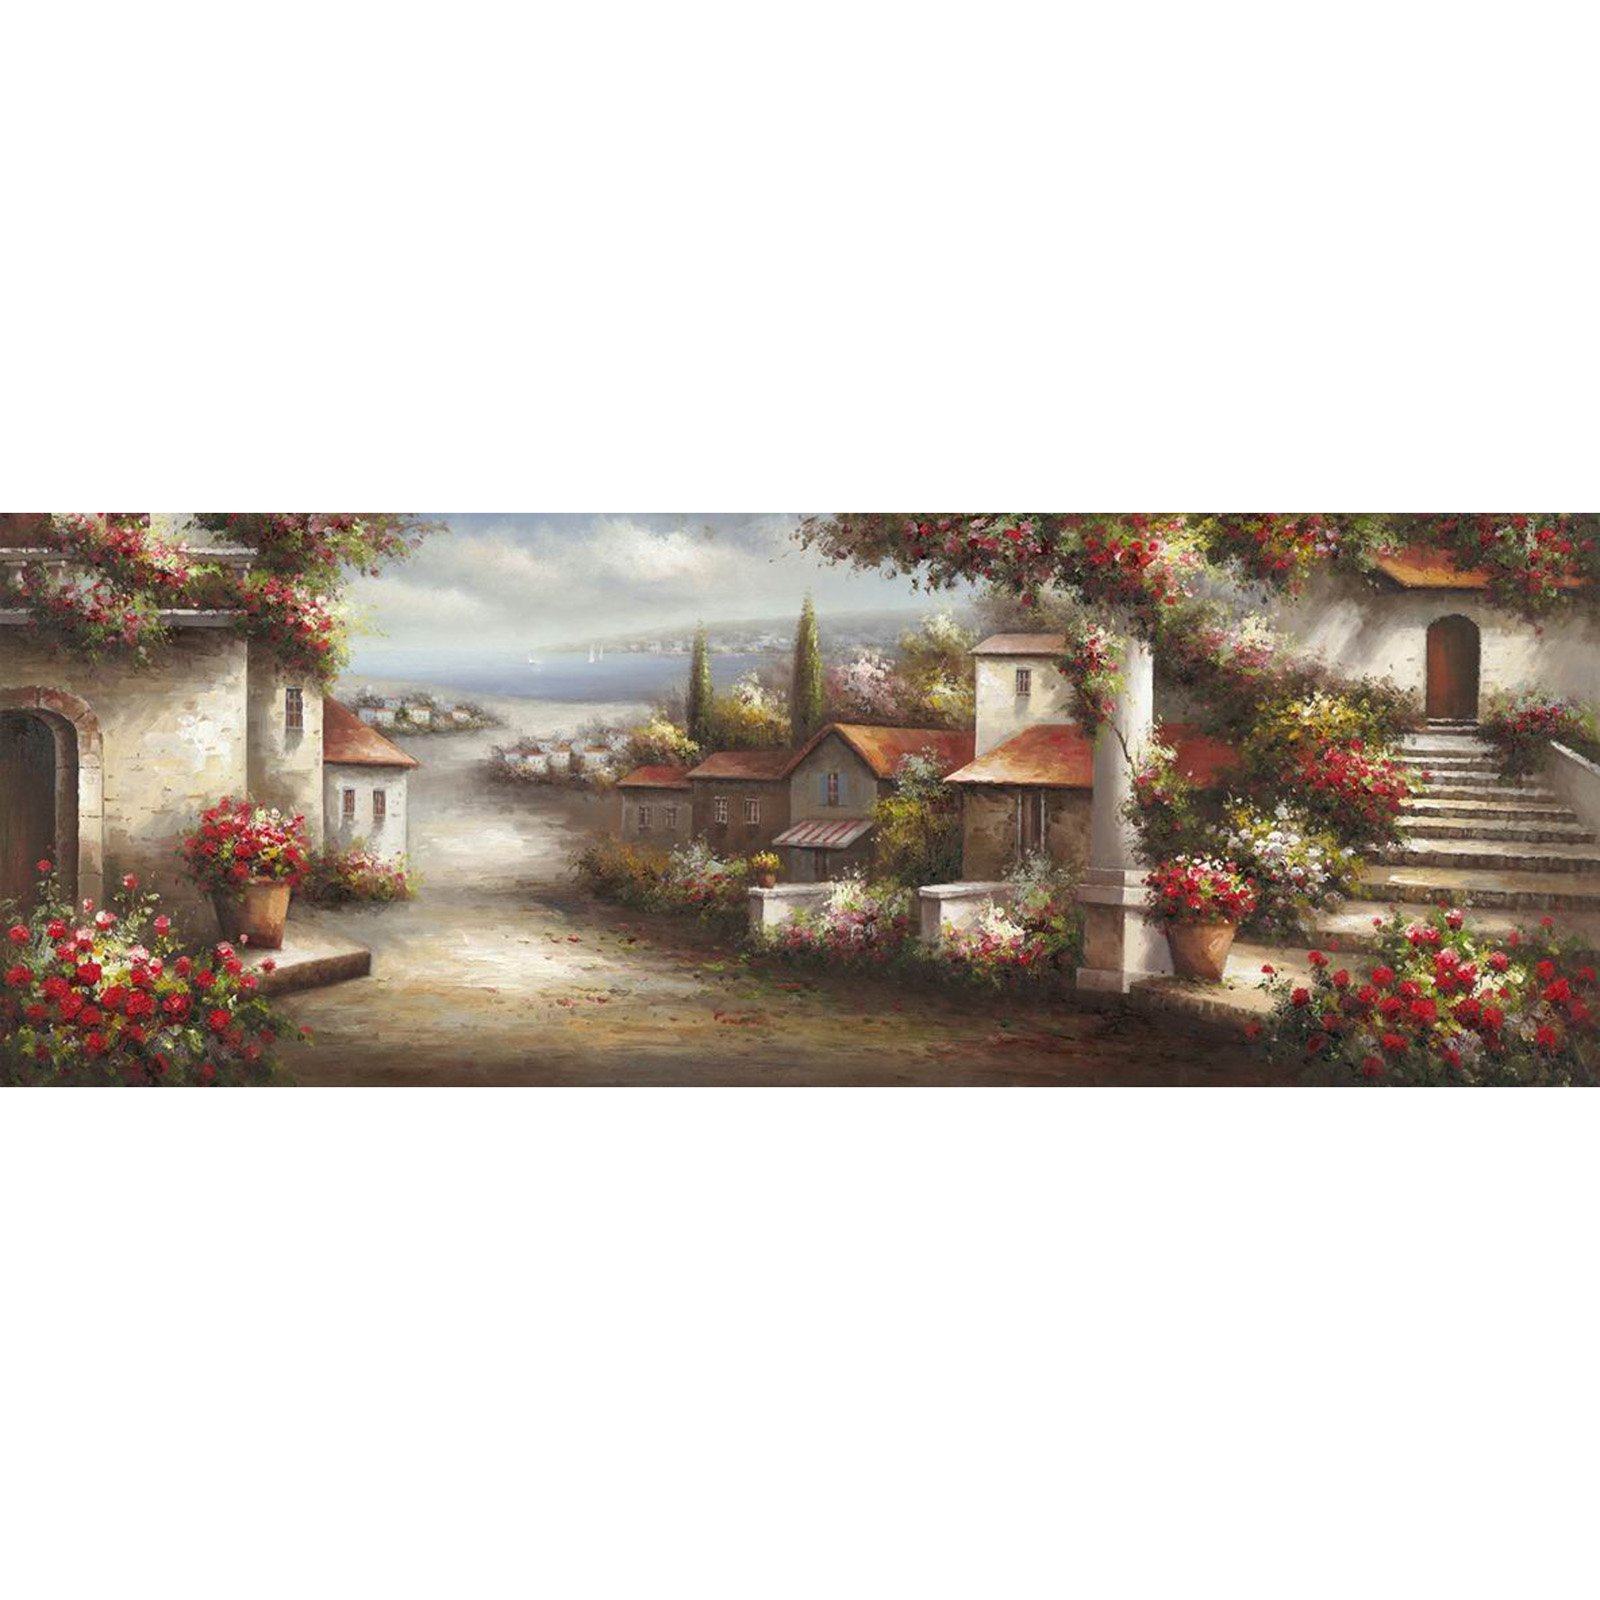 Yosemite Home Decor YJ140887B Charlestown Beach Wall Art Room Décor